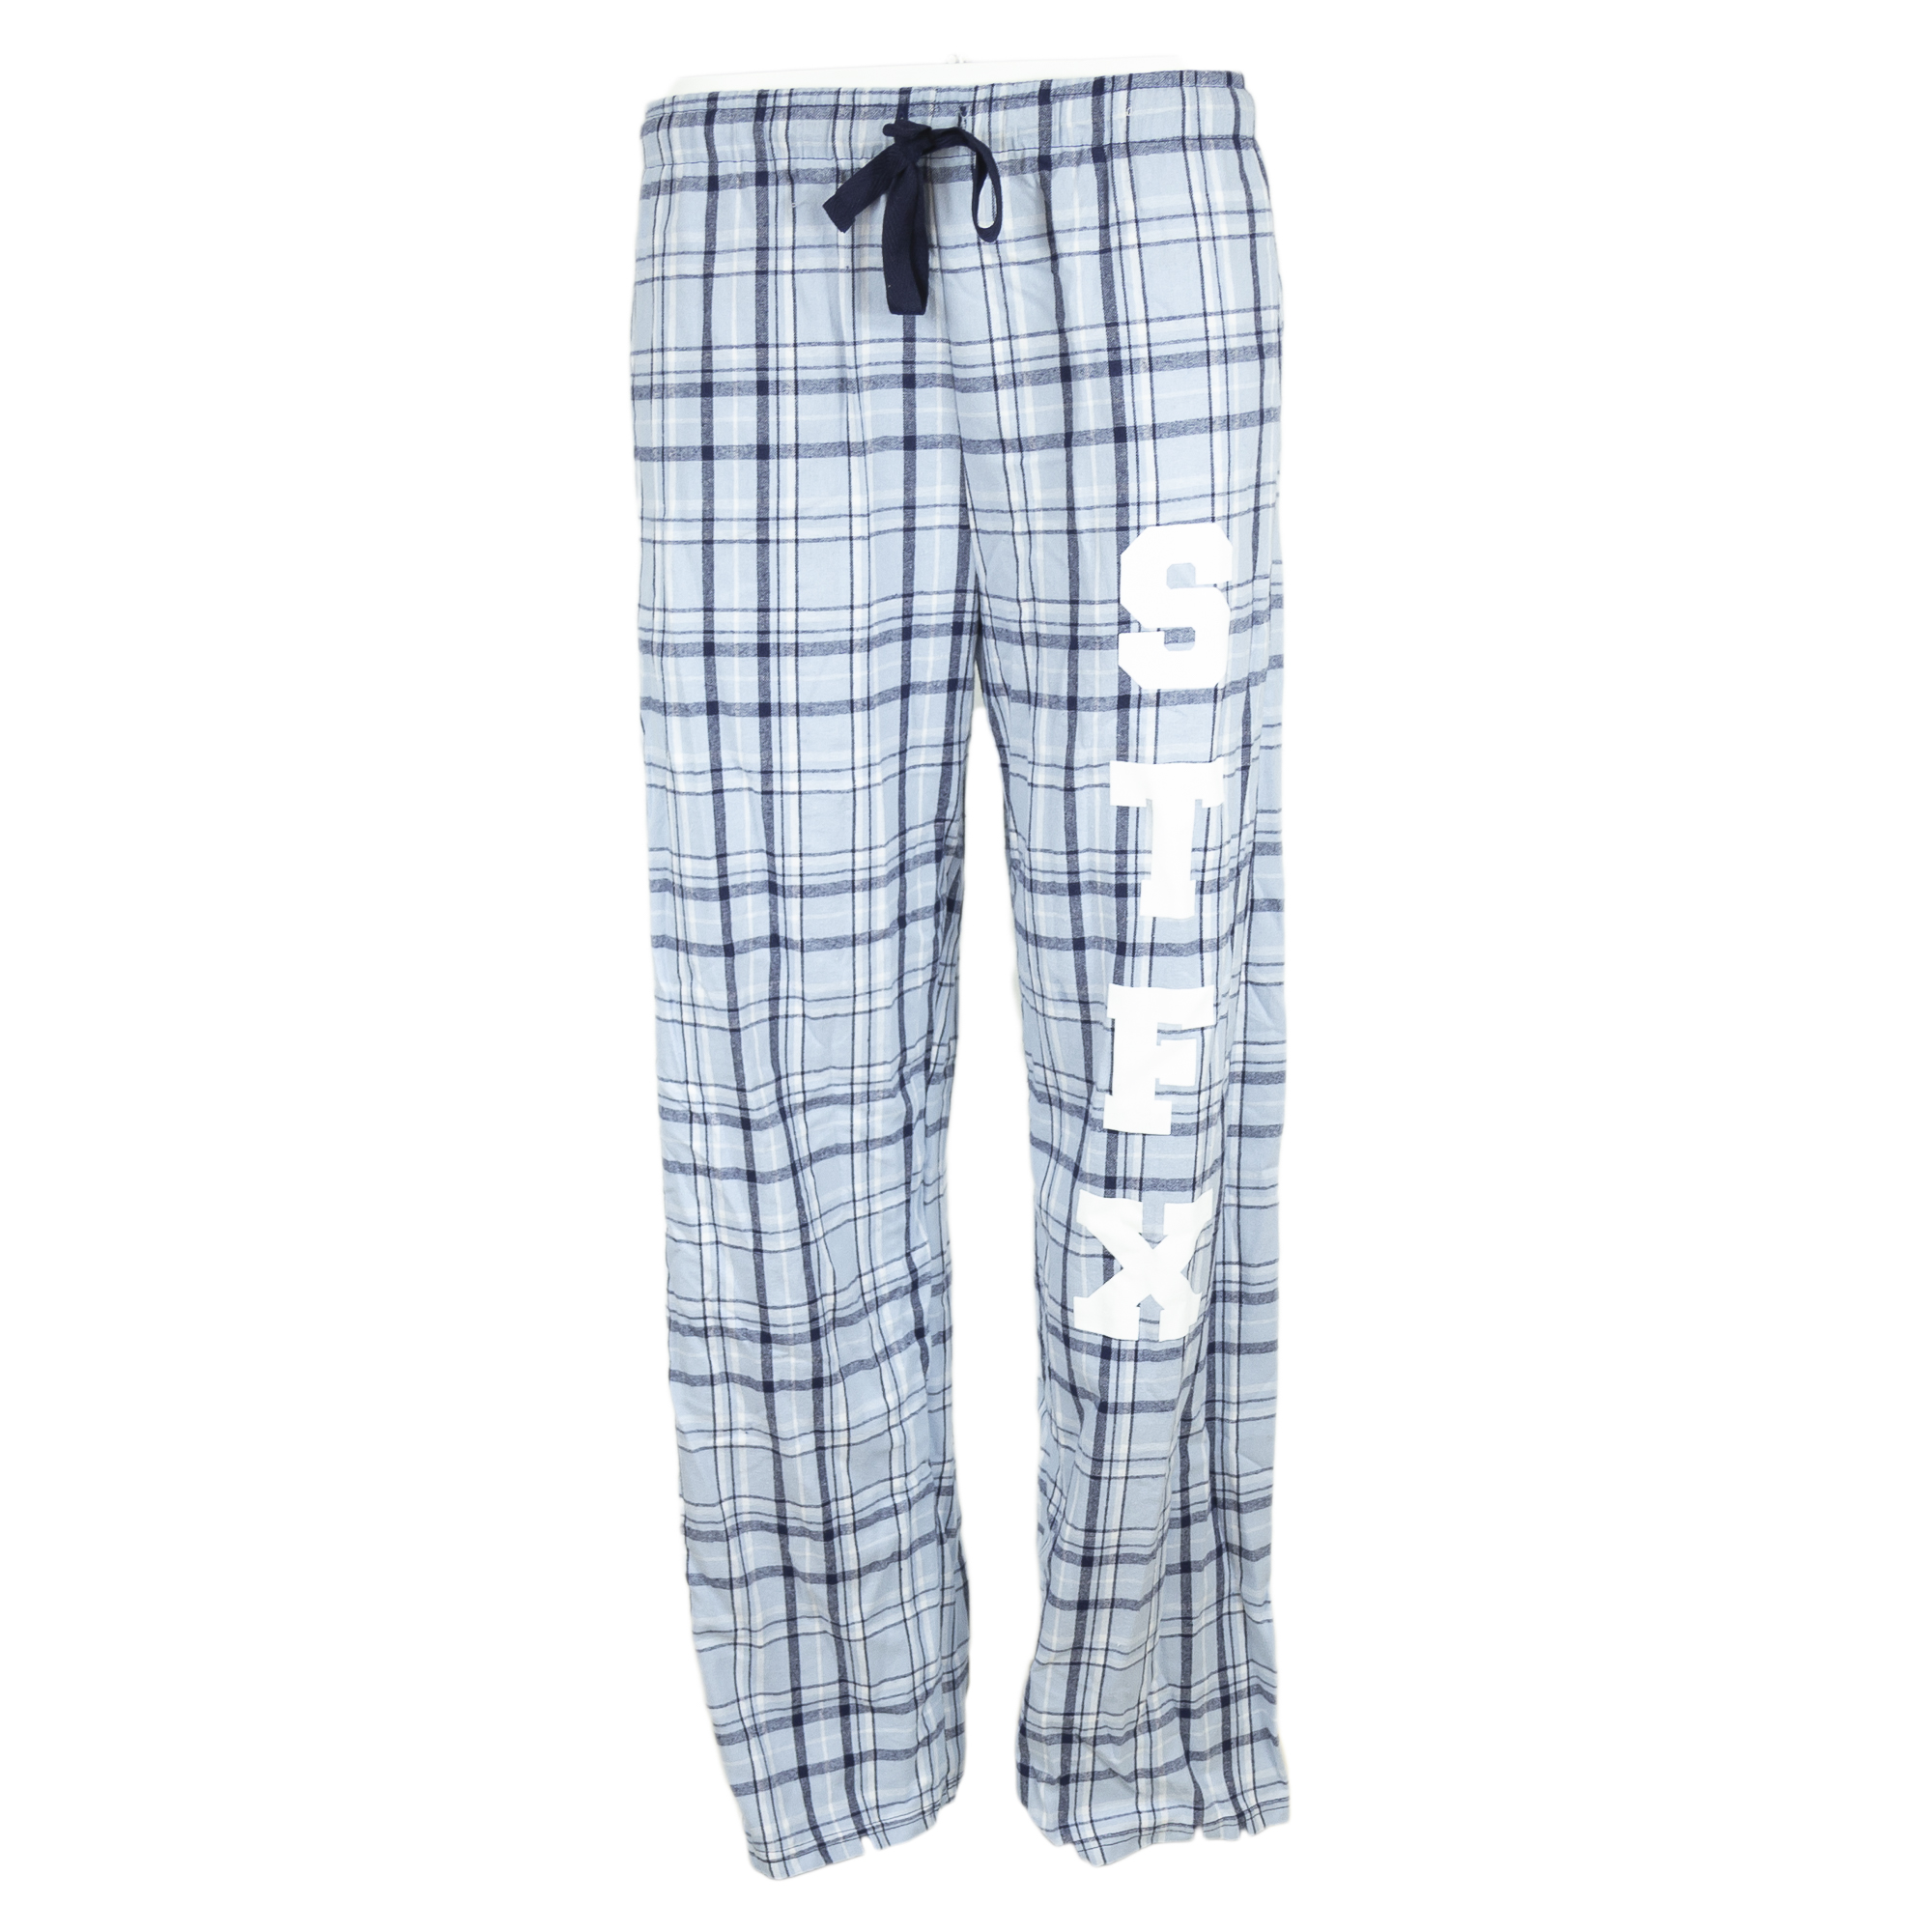 Home Pants STFX flannel pyjamas. 🔍. Previous  Next febae3b79